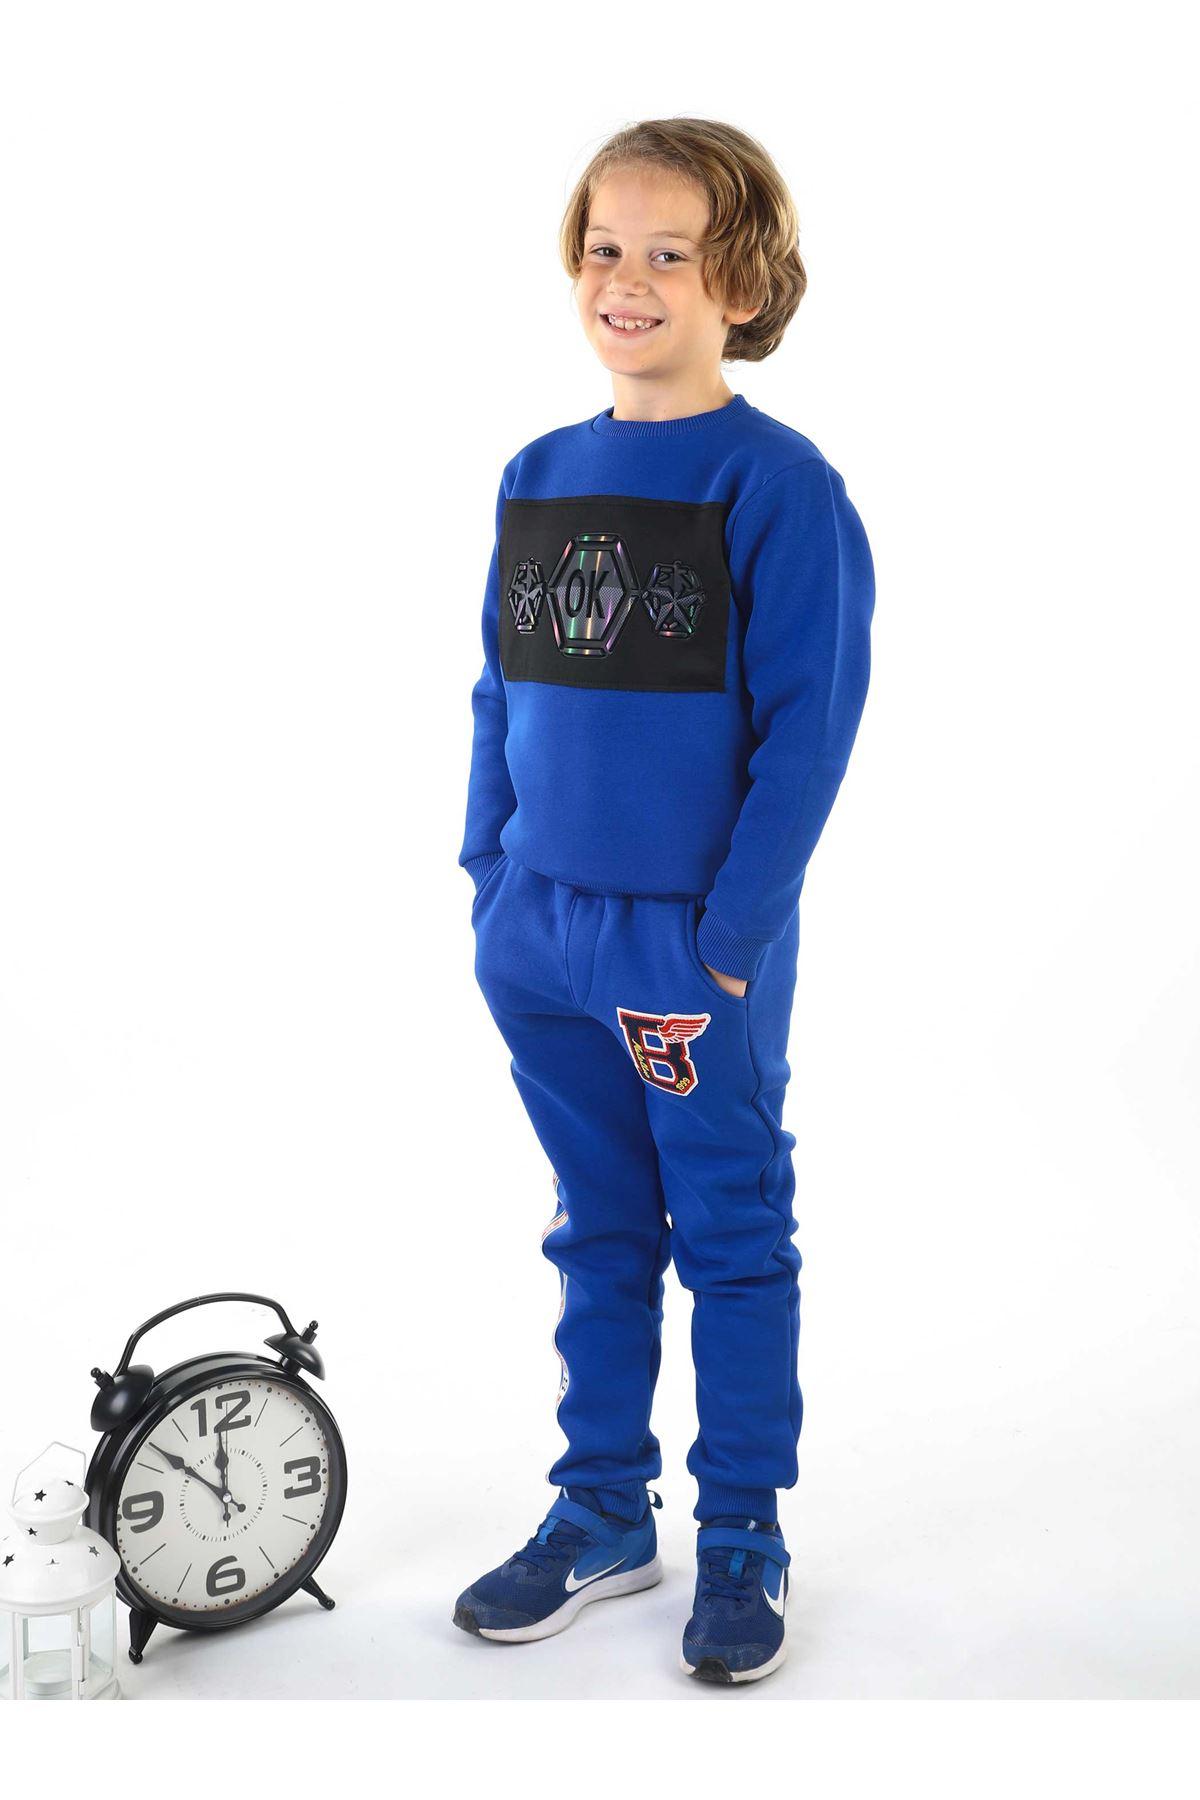 Sax Winterisation Male Child Sweatshirt